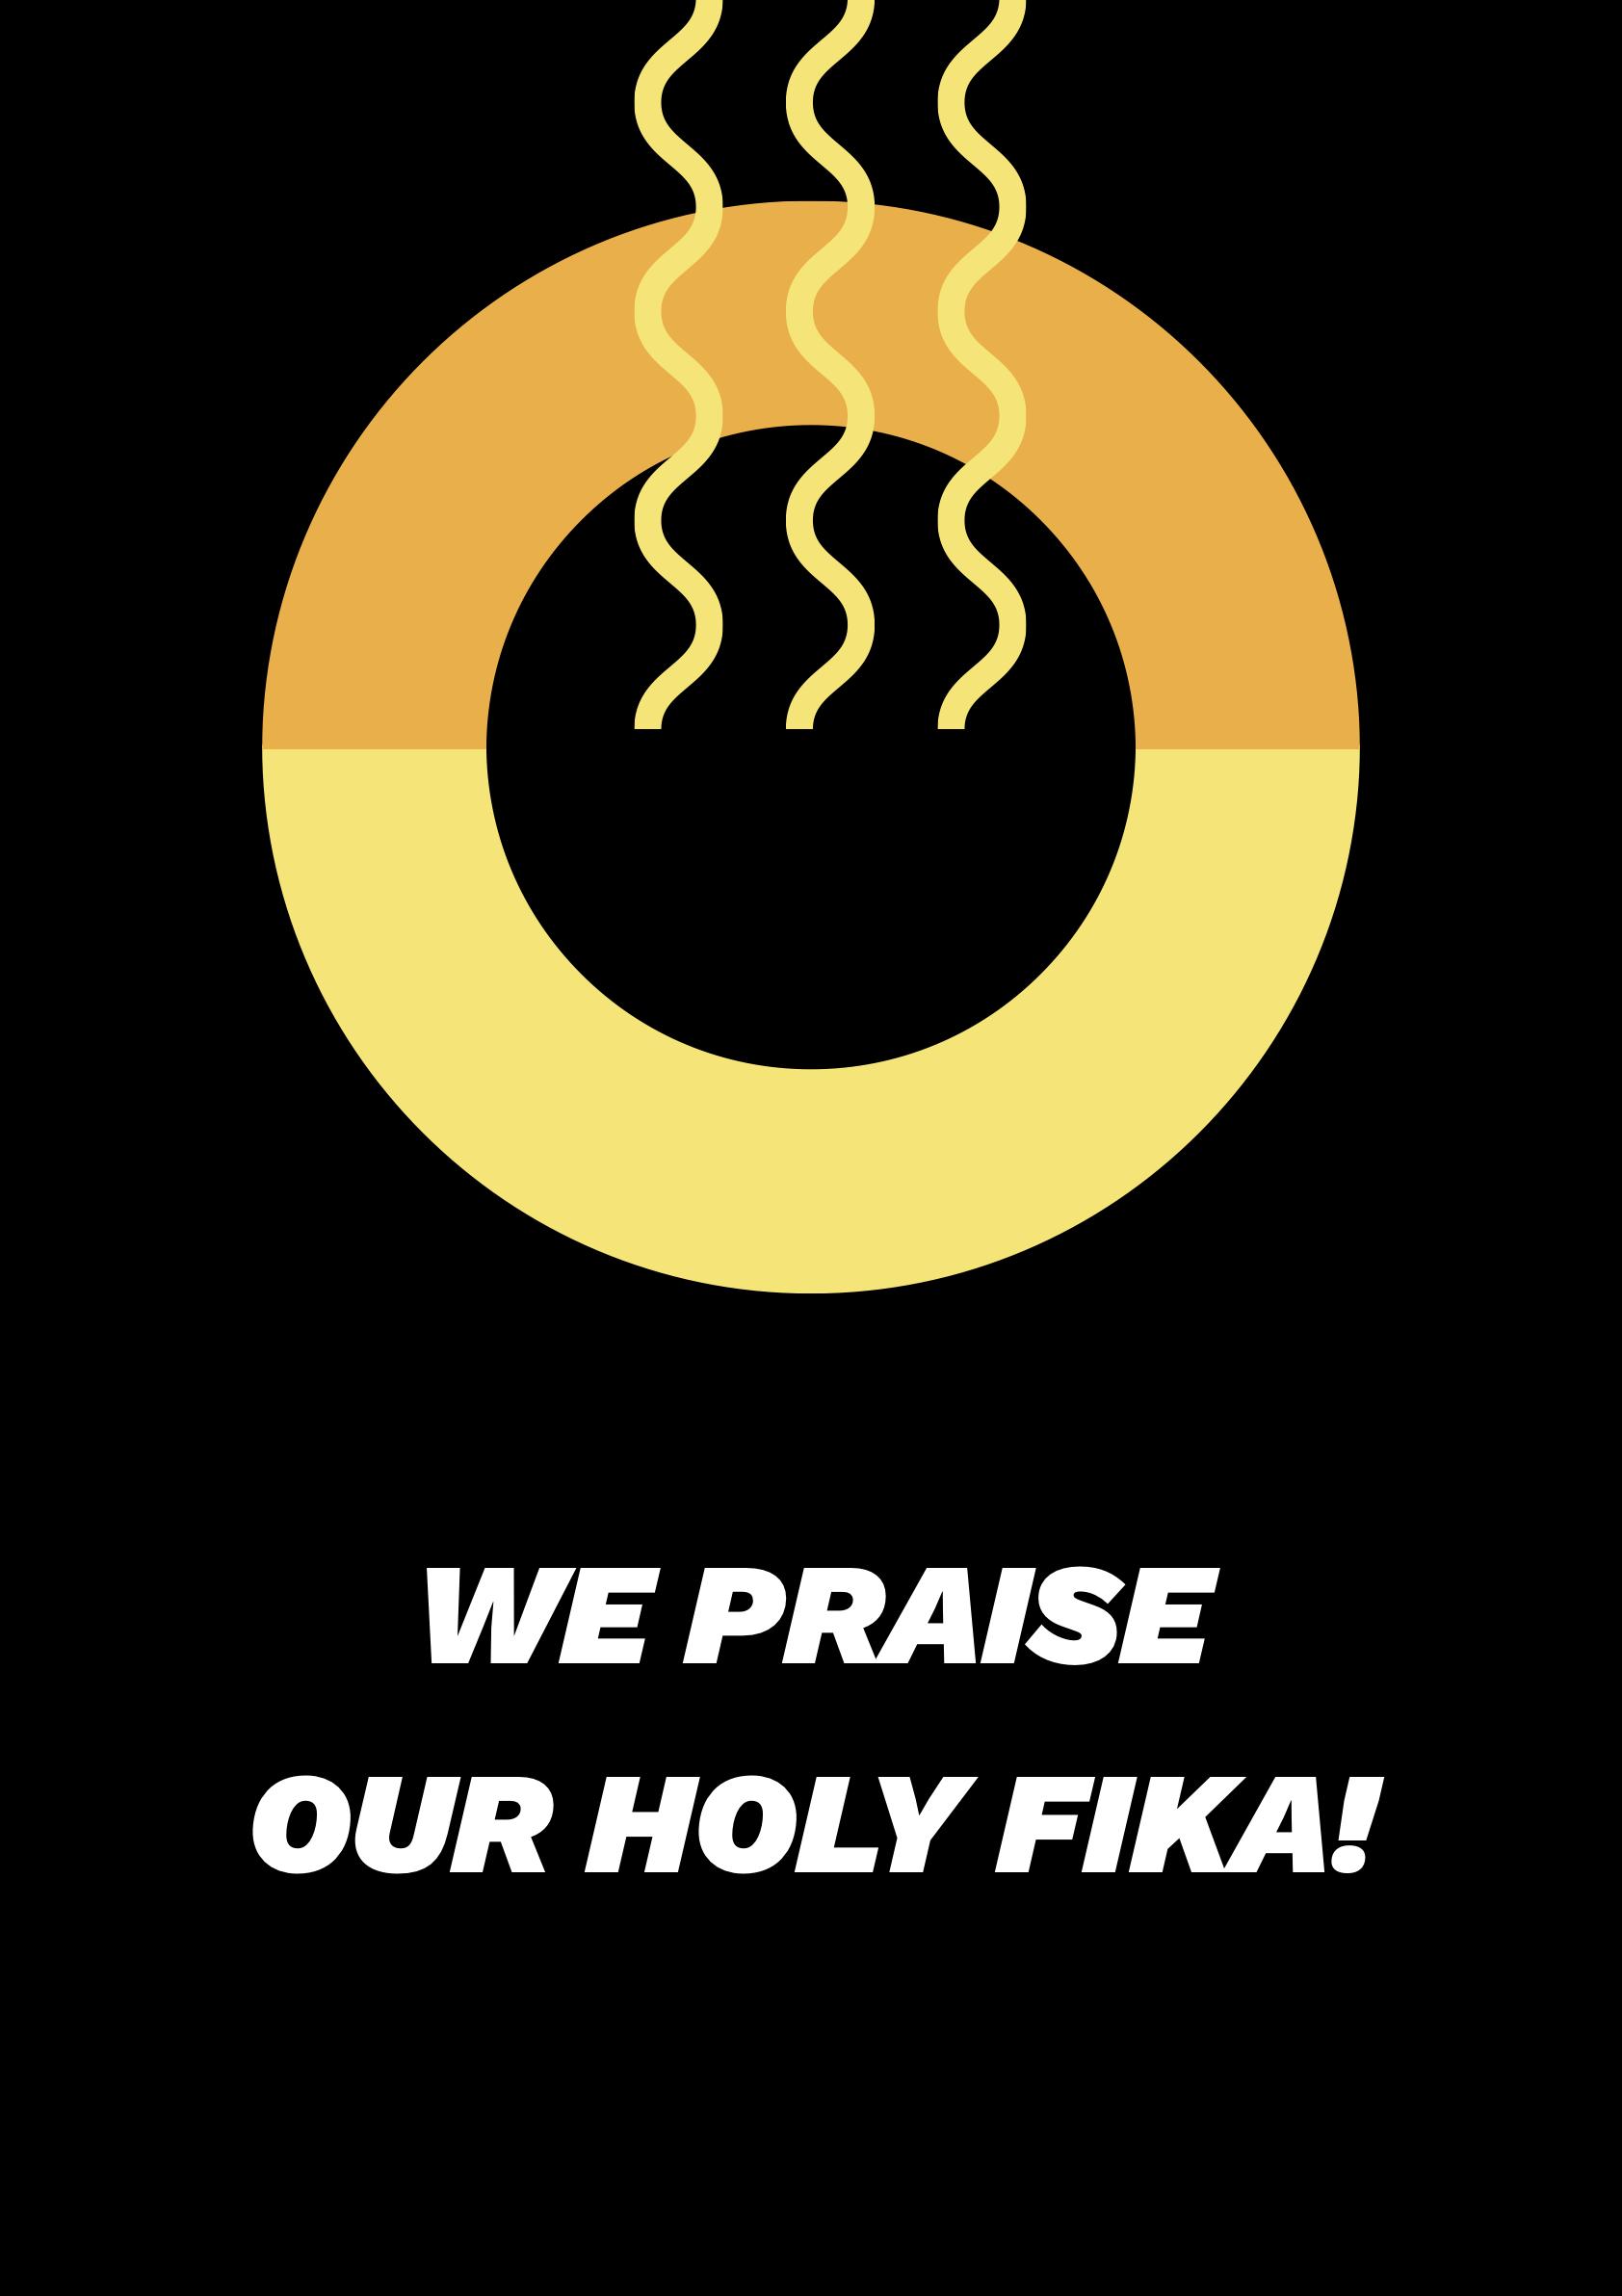 FIKA.png